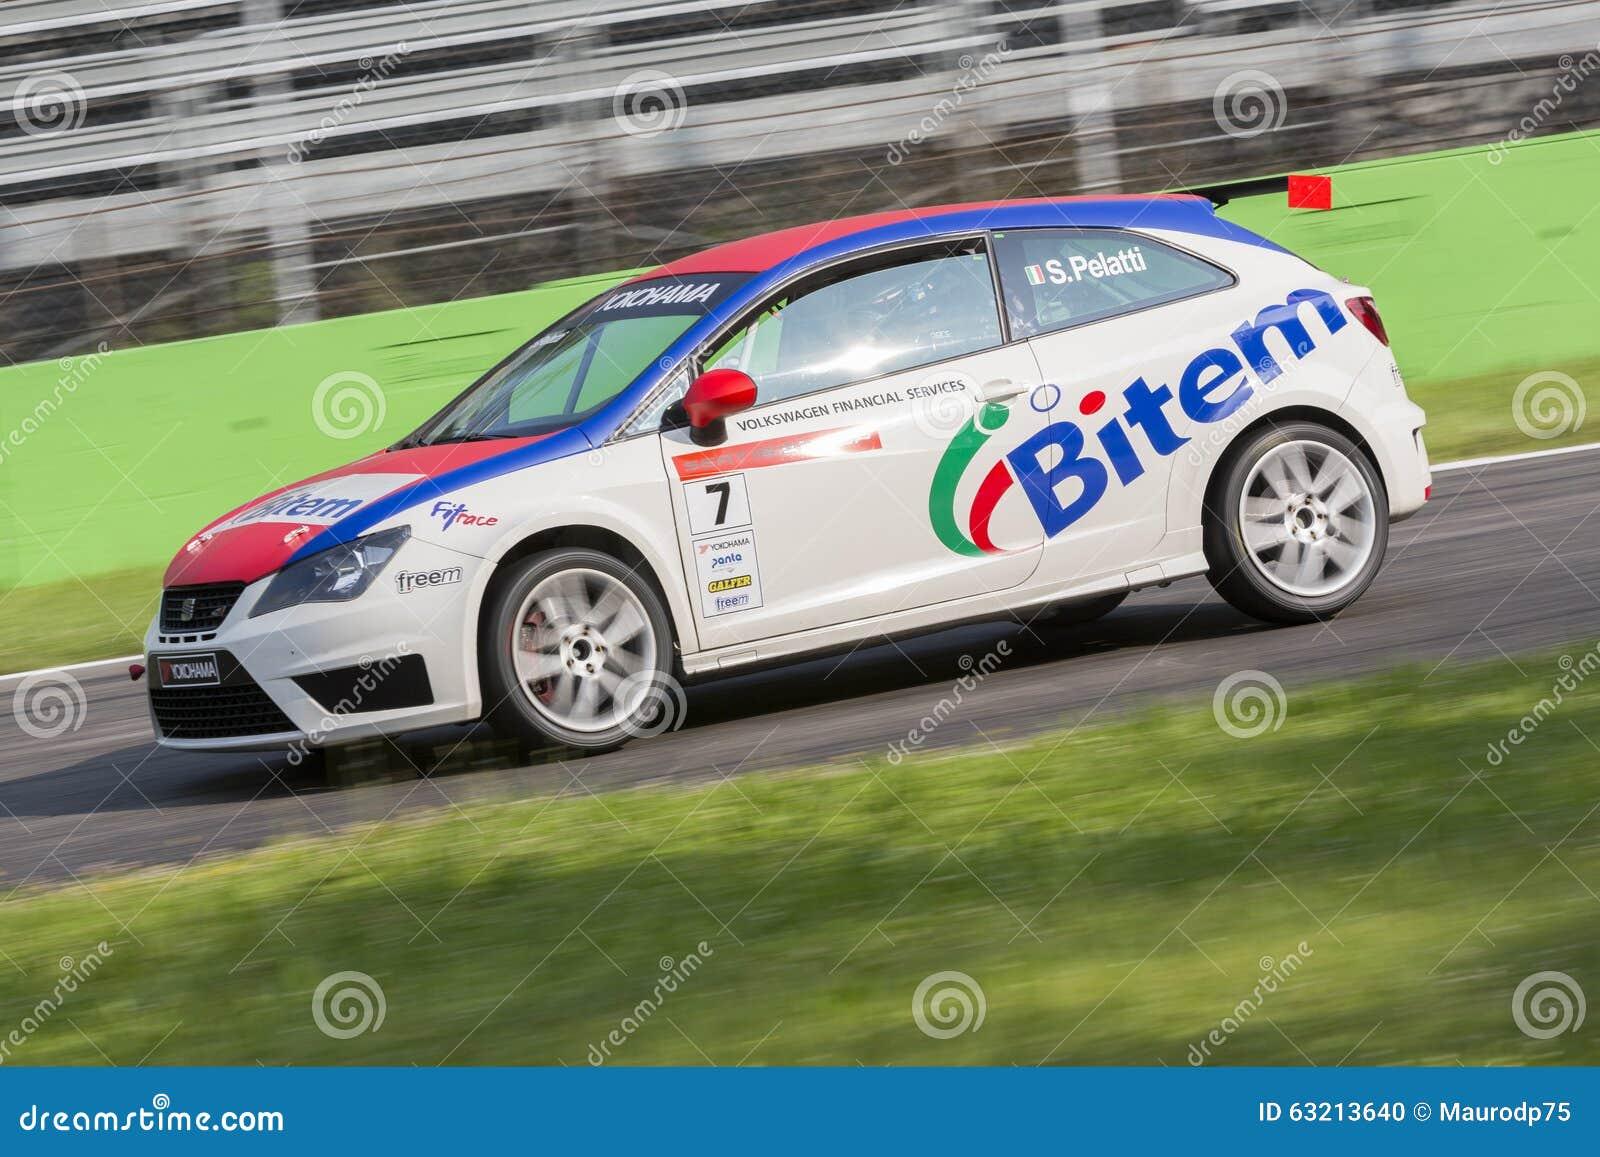 Circuit Monza Italia : Monza italy may seat ibizia u girasole team driven